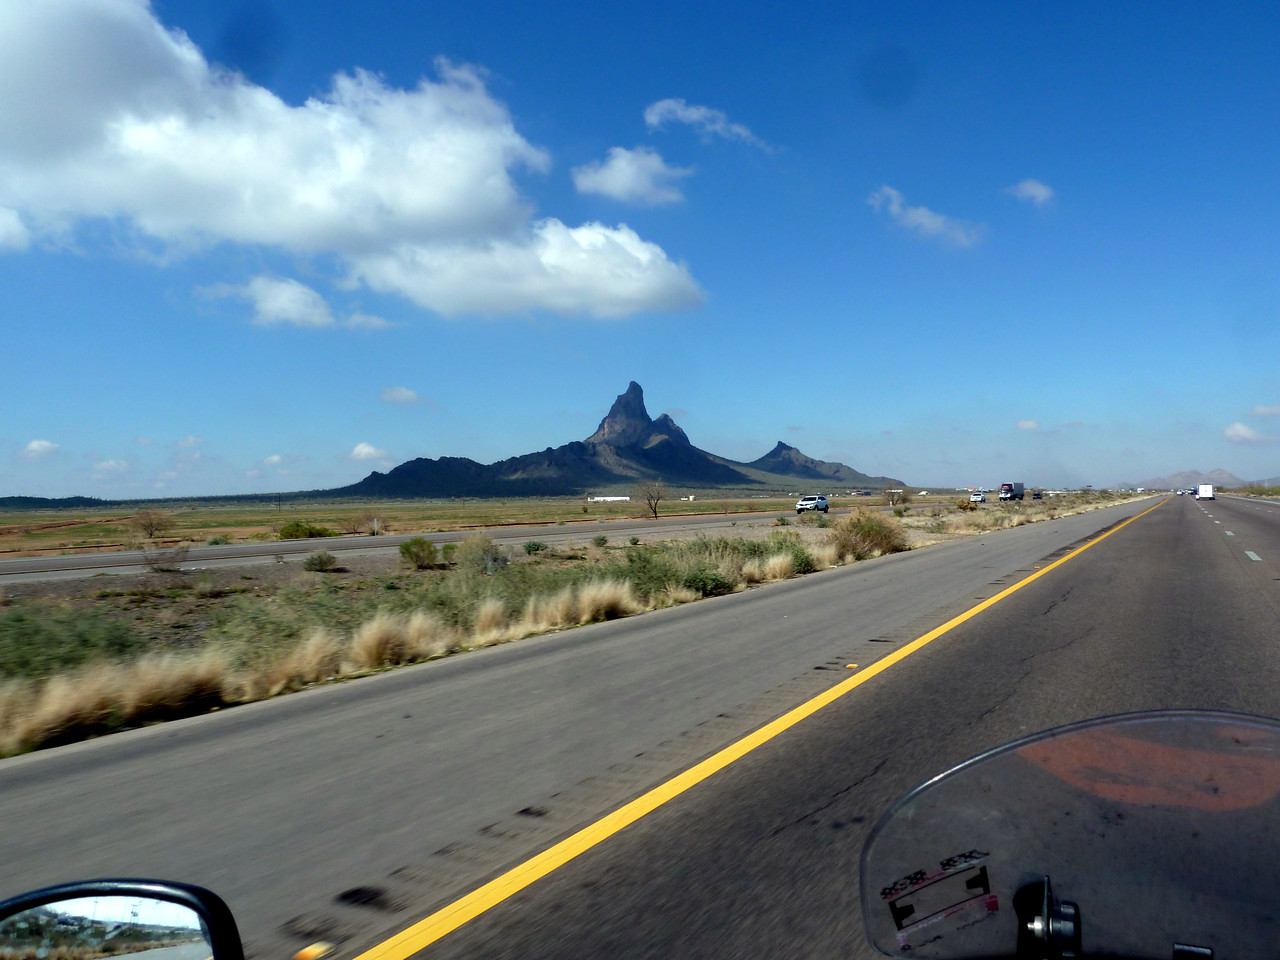 Cool Coyote/Roadrunner style terrain.